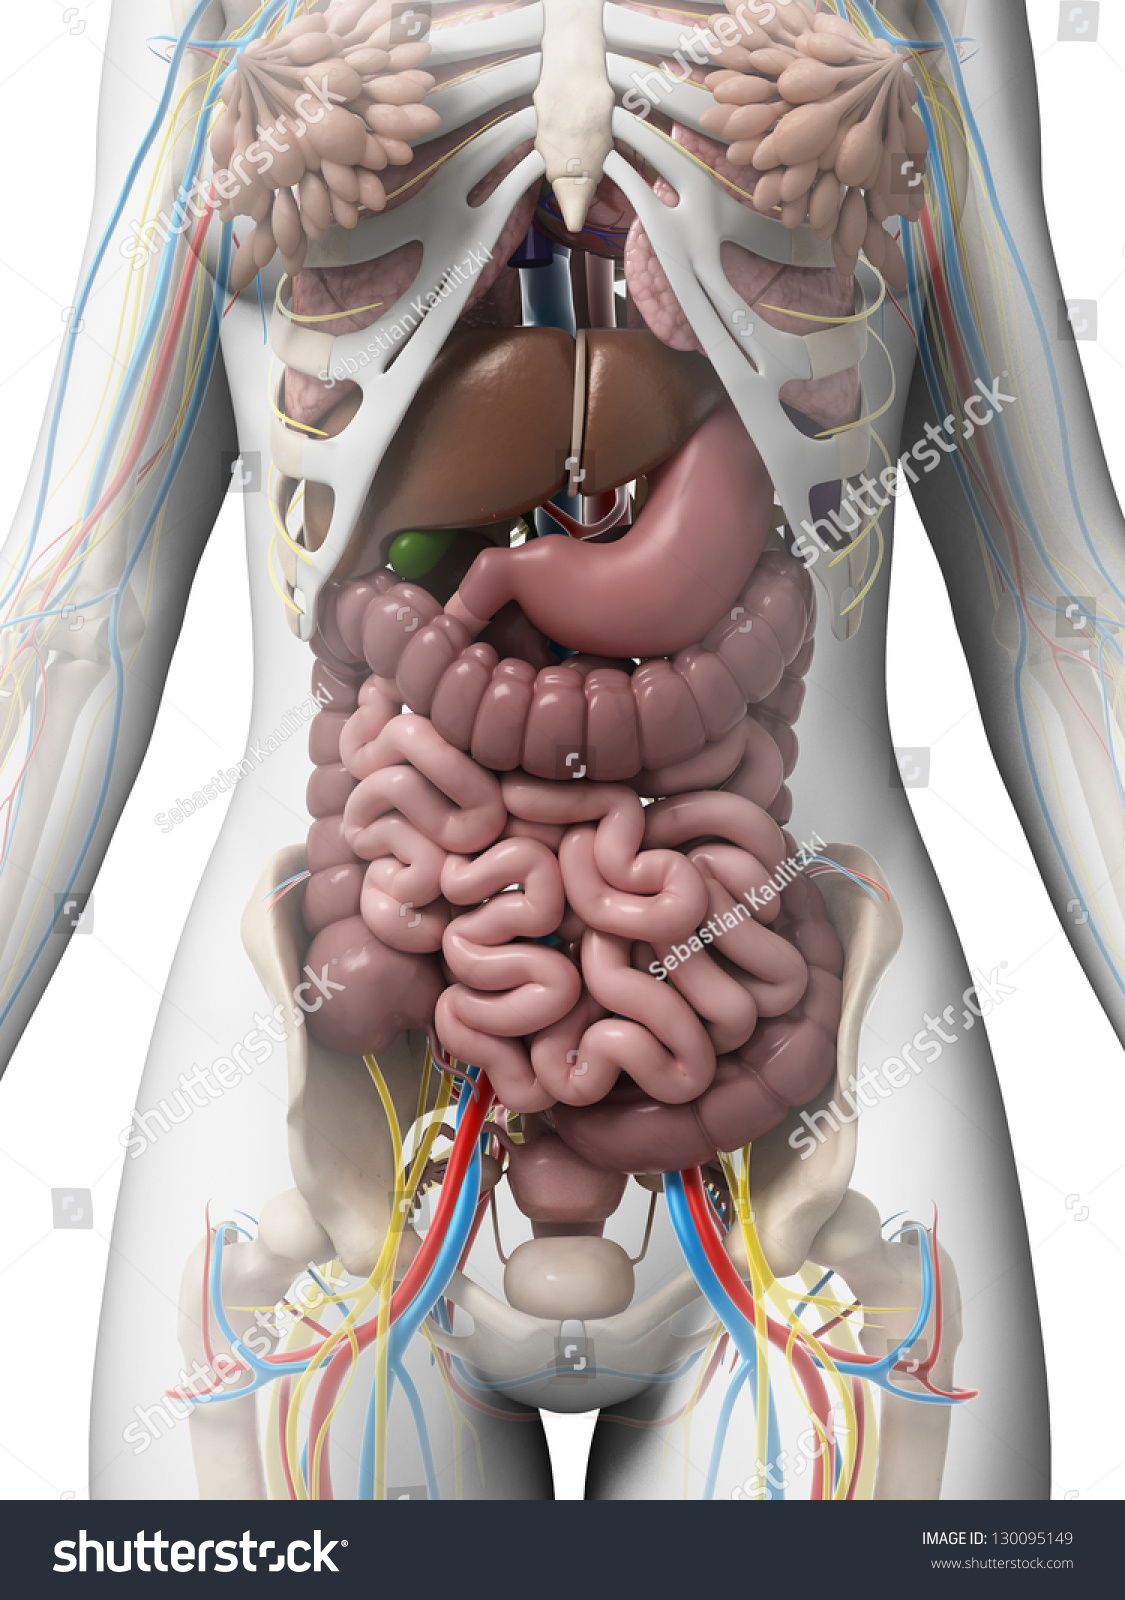 3 D Rendered Illustration Female Anatomy Stock Illustration